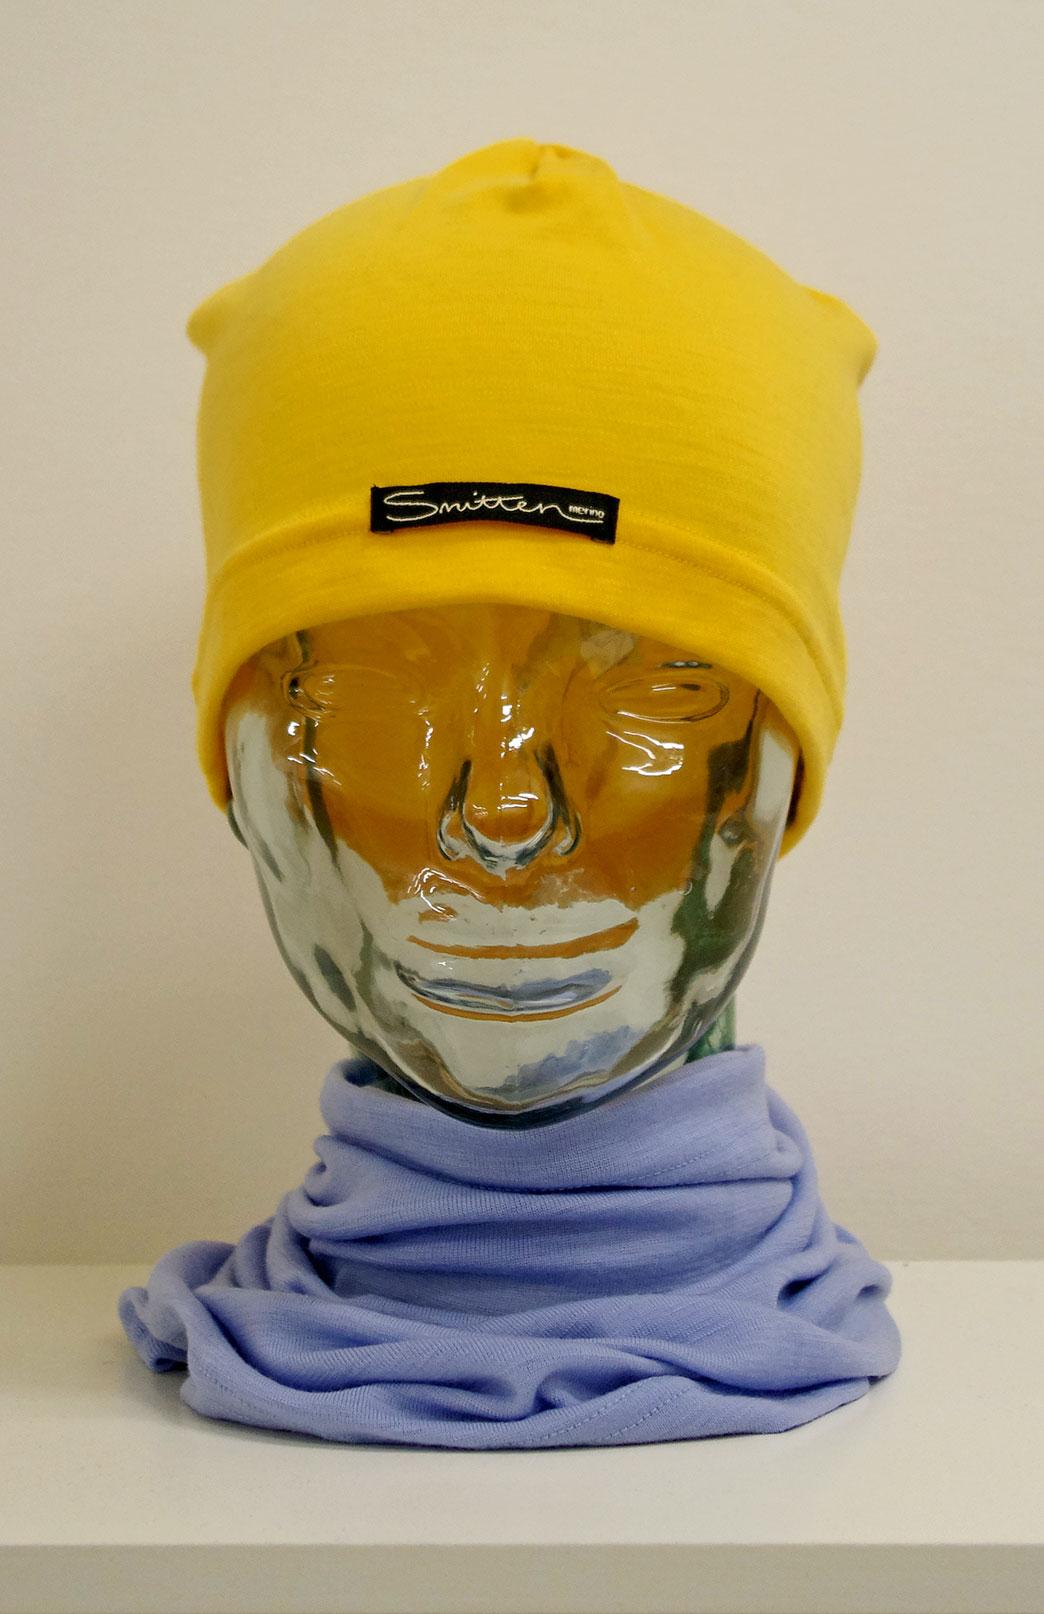 Beanie - Mid-weight Loose Fit Skull Cap - Unisex Yellow Merino Wool Loose Fit Beanie Skull Cap - Smitten Merino Tasmania Australia